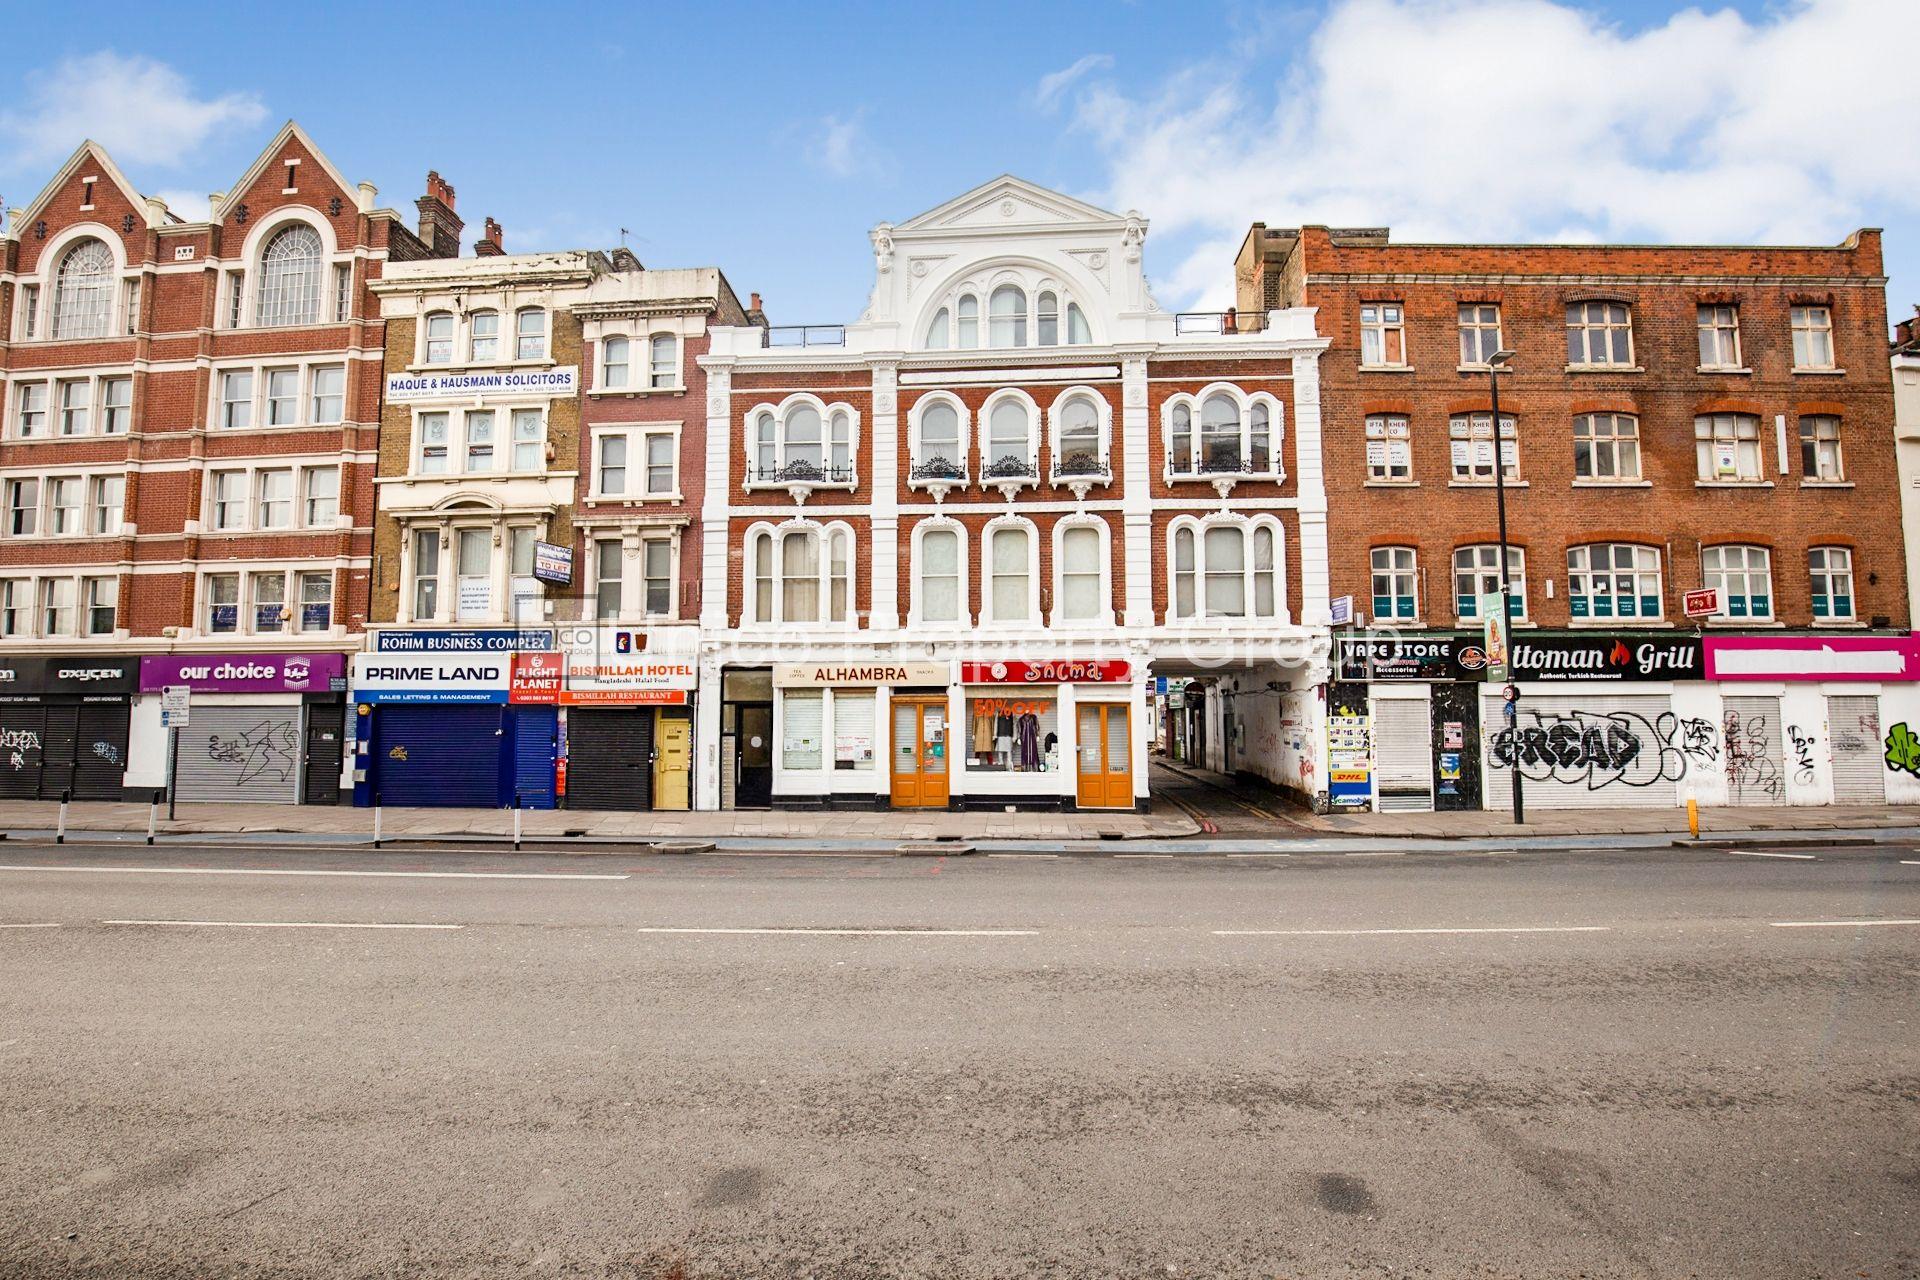 Whitechapel Road, London